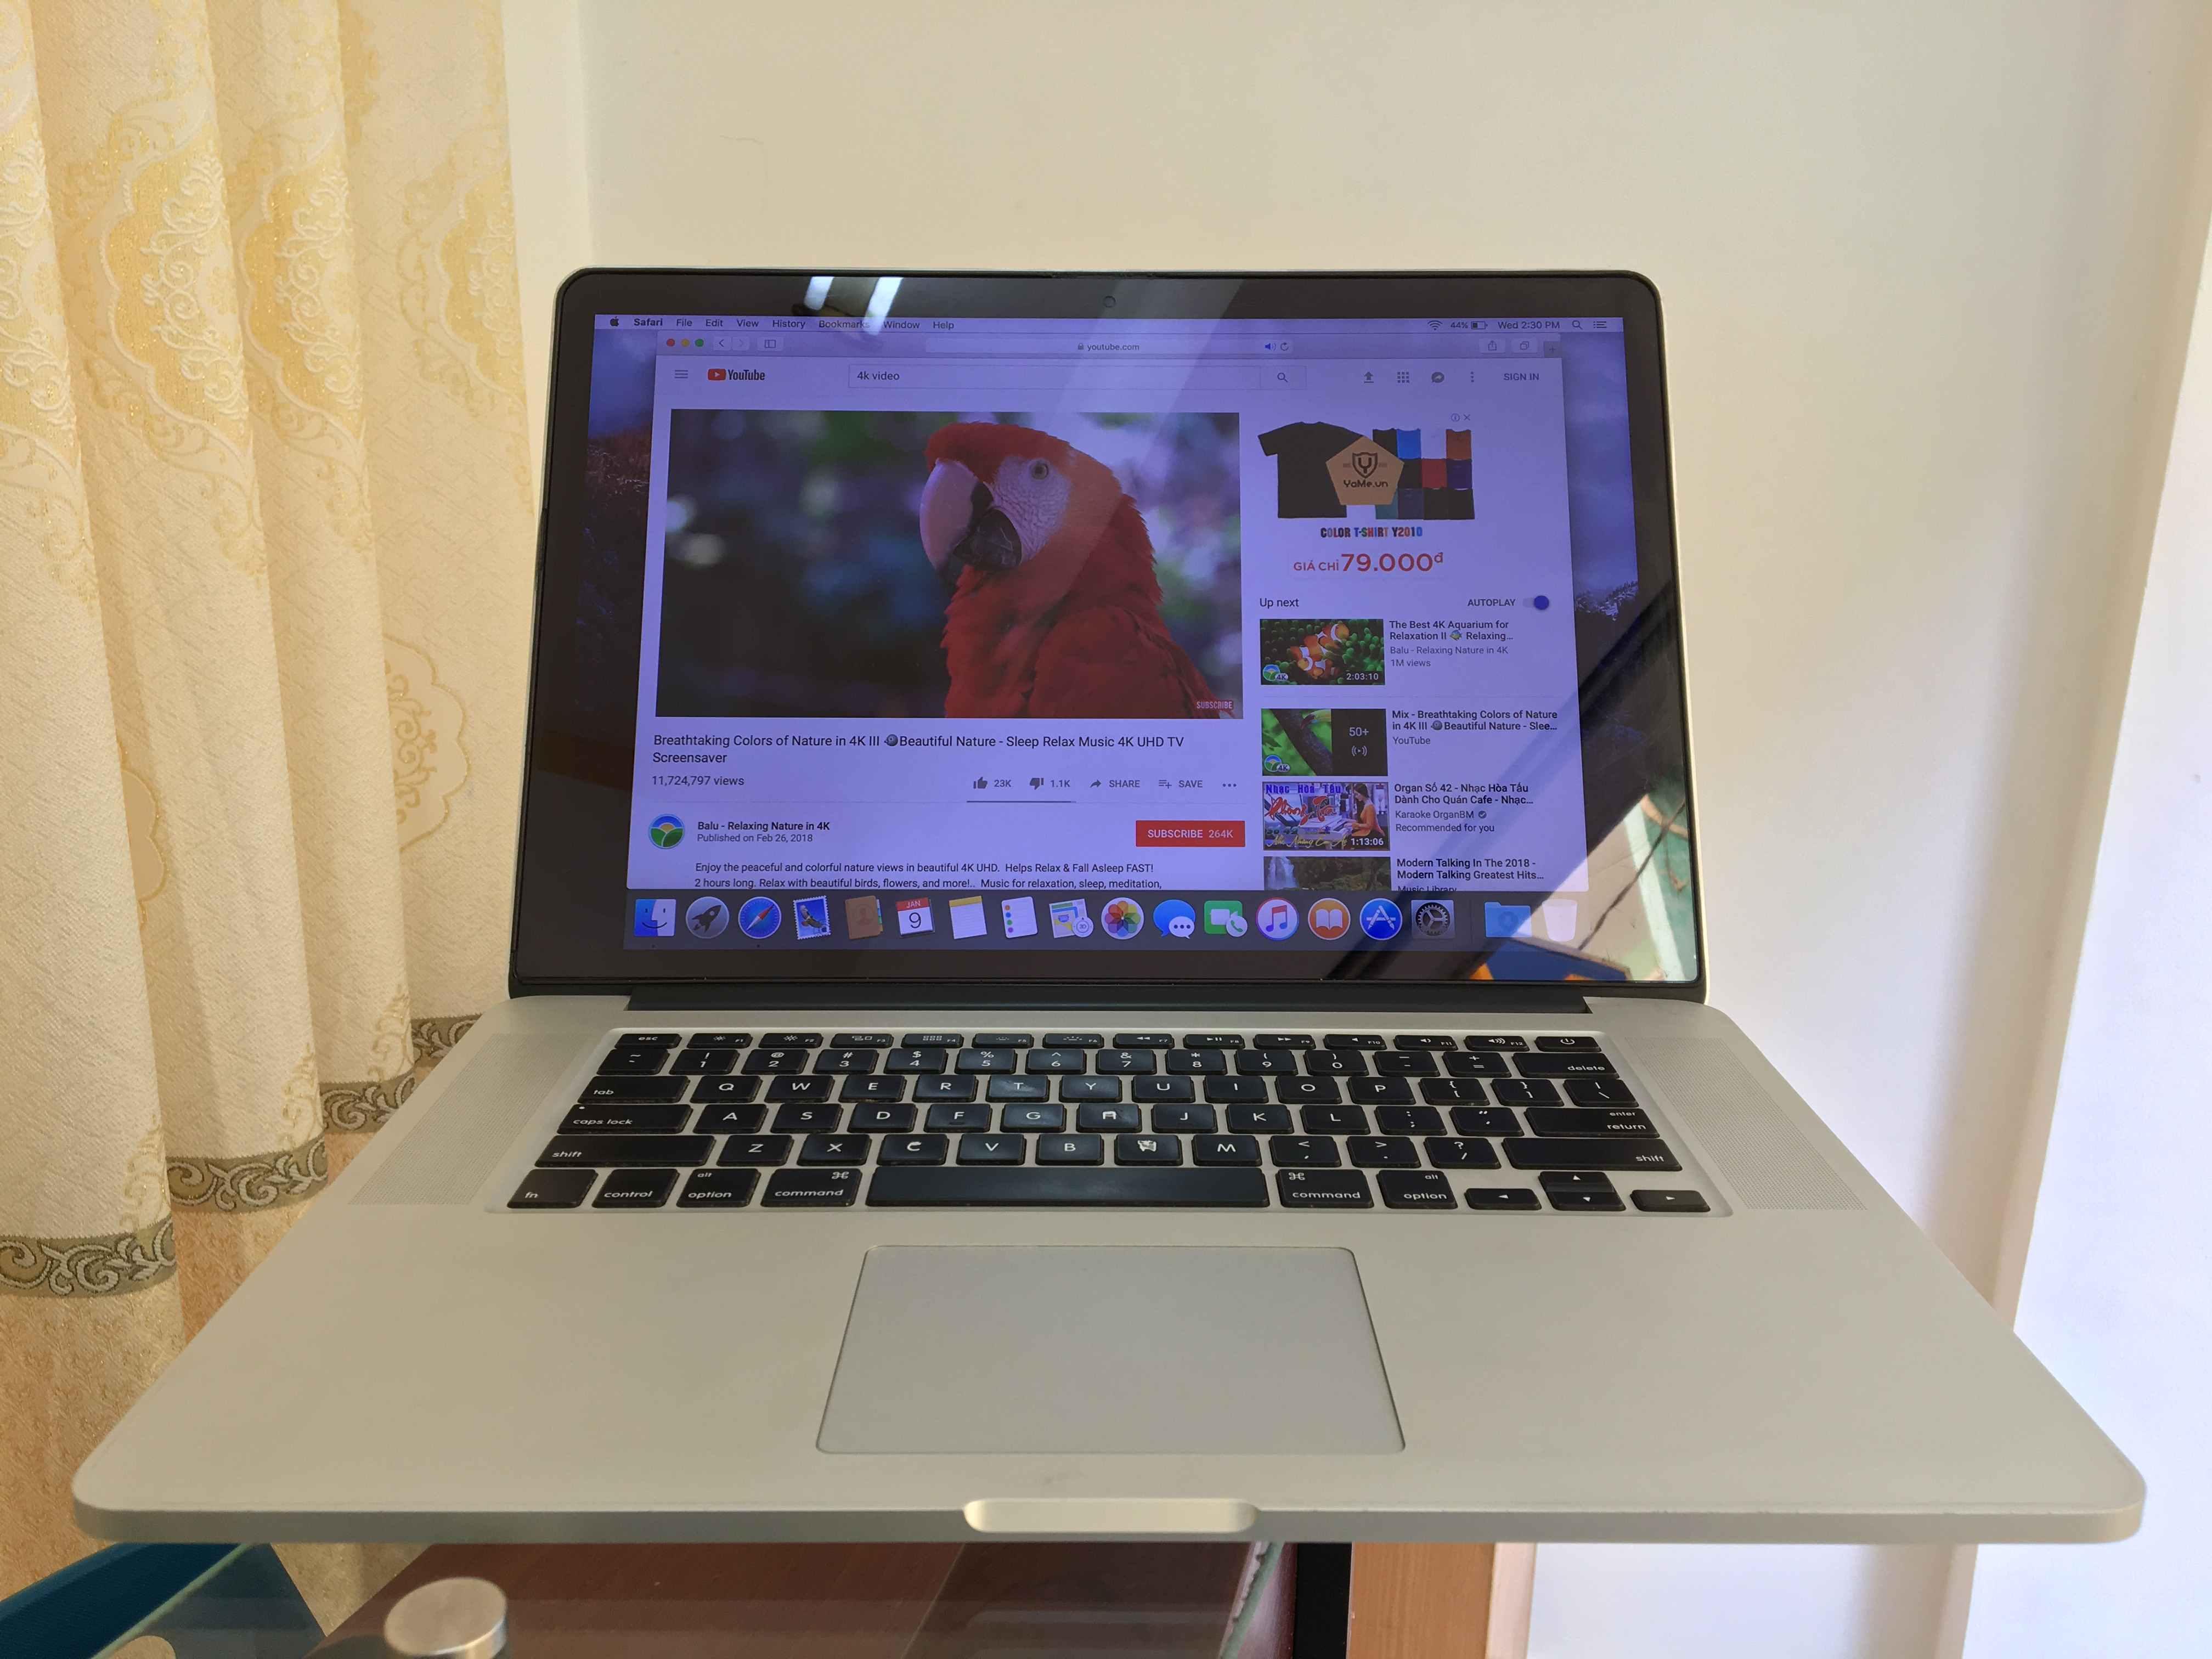 MacBook pro i7 2013 (5)